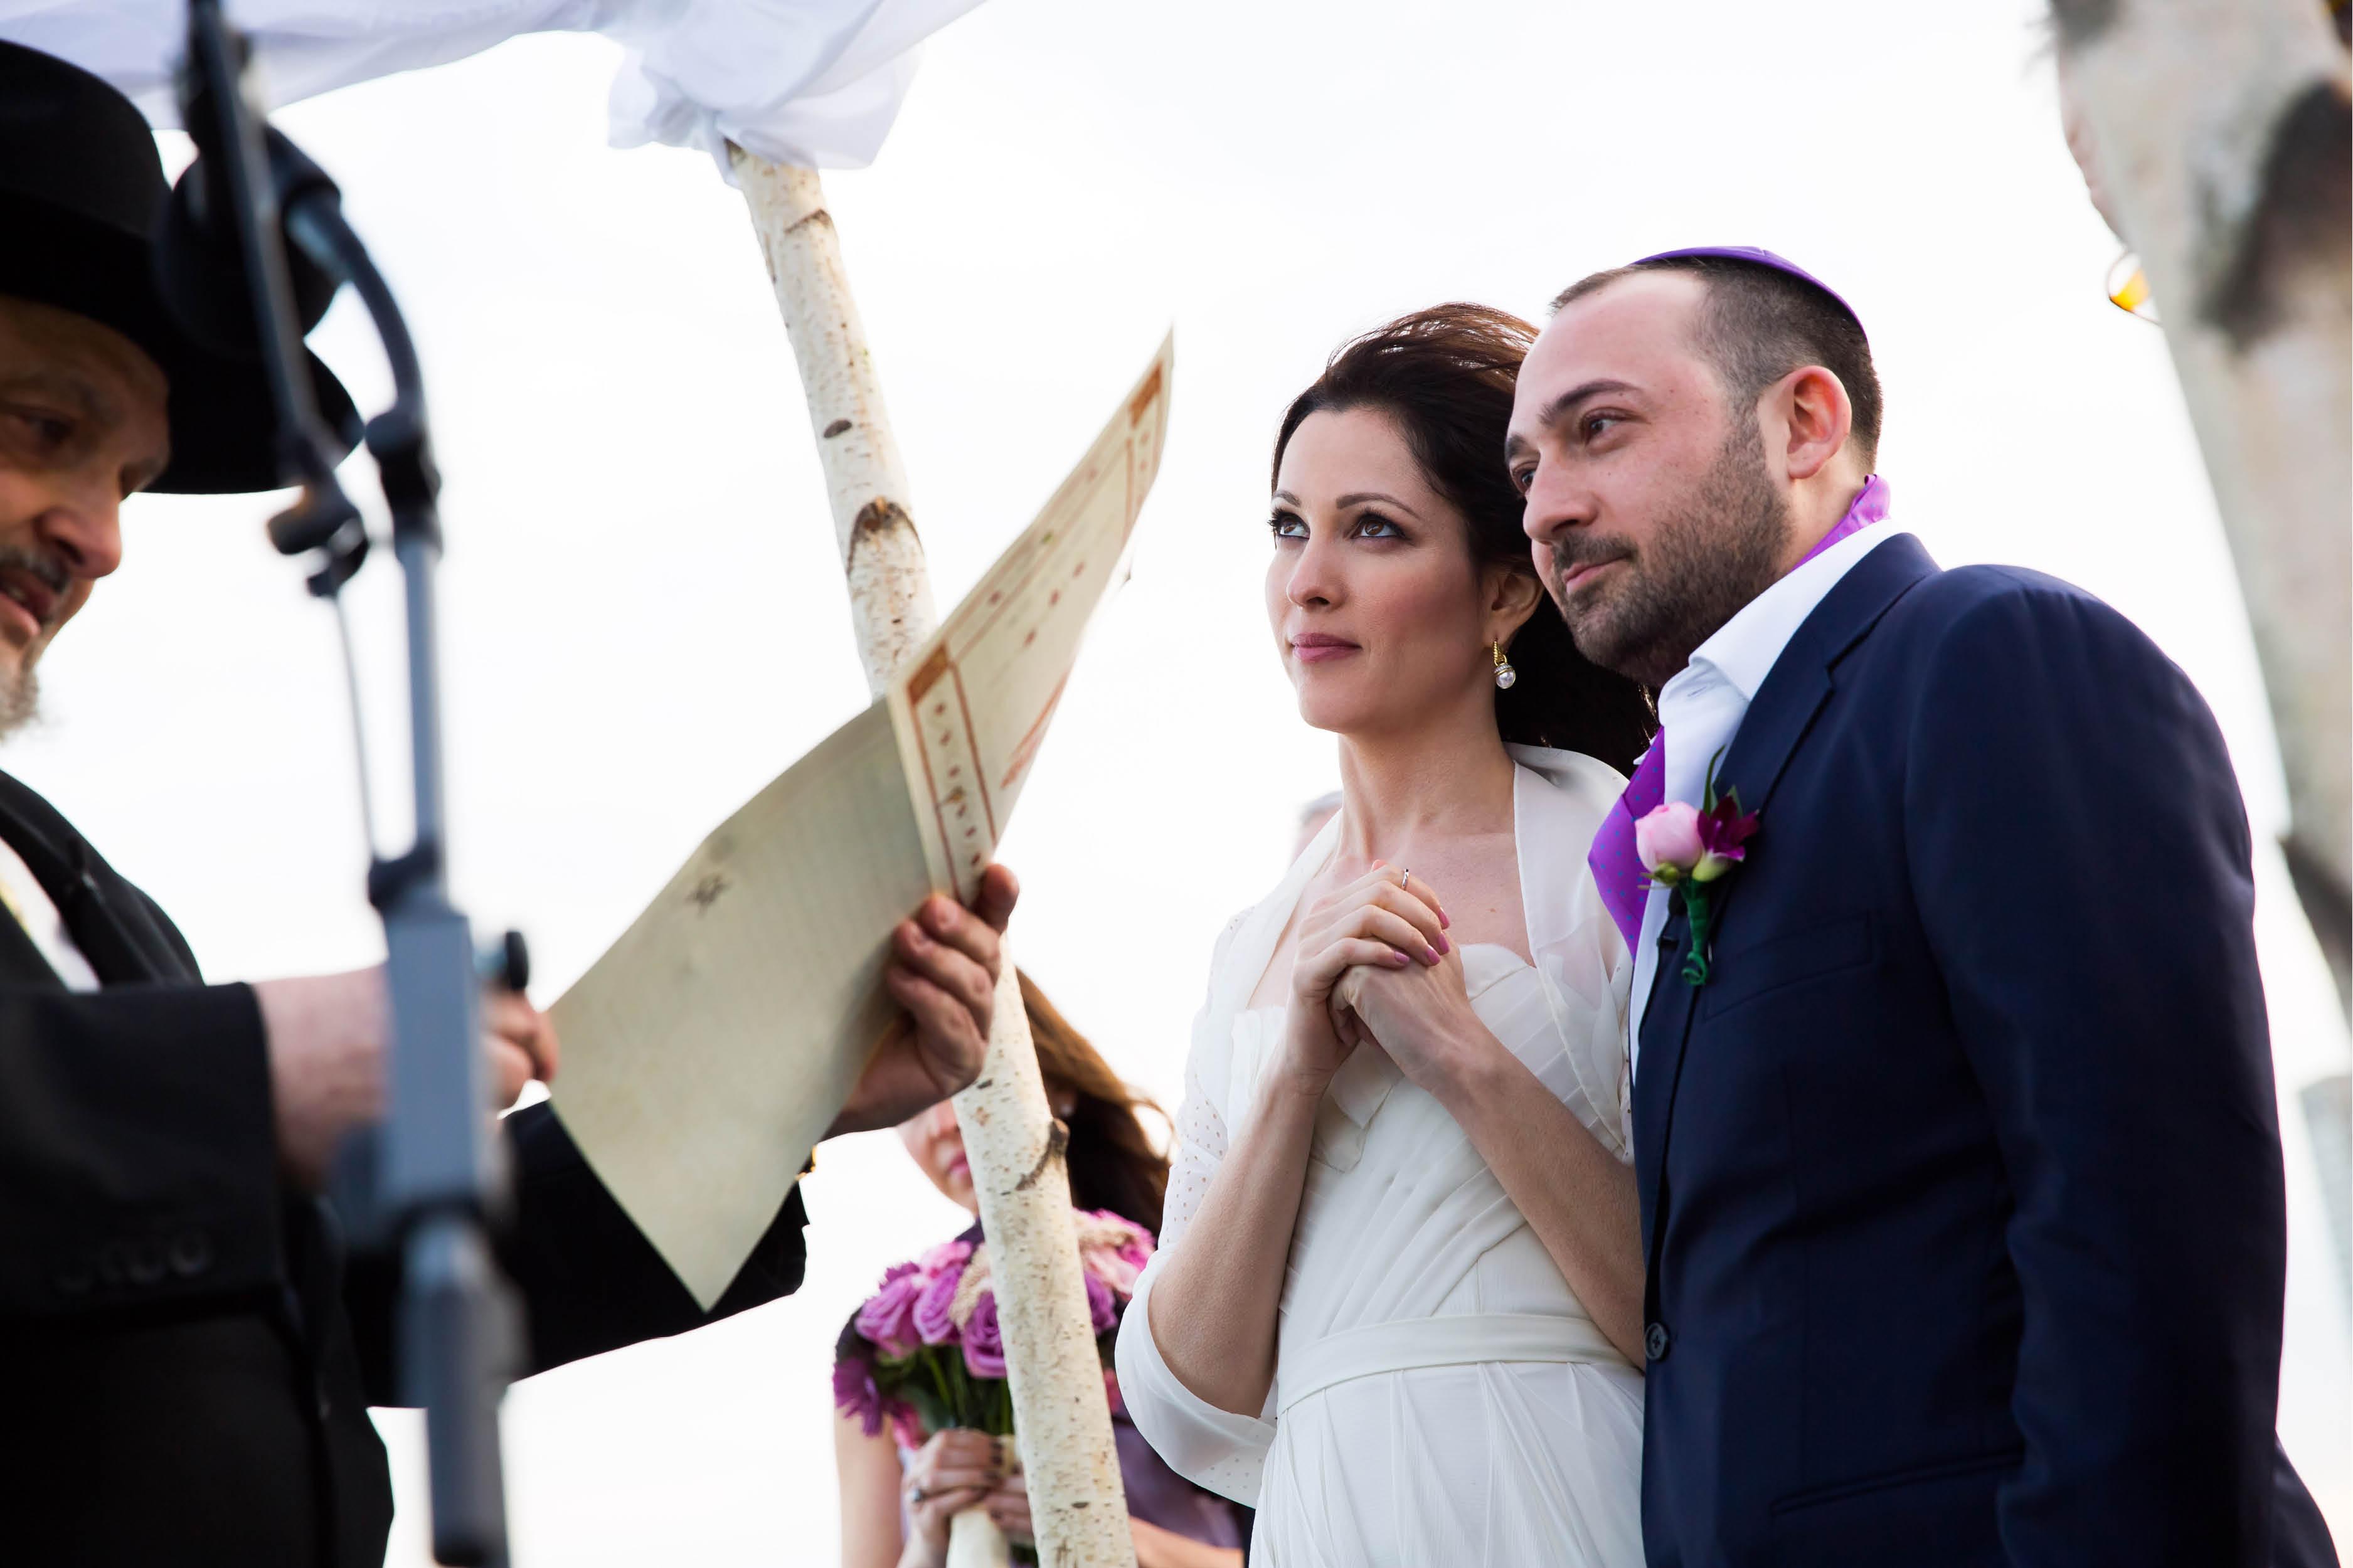 Emma_cleary_ photography_Waterside NJ wedding10